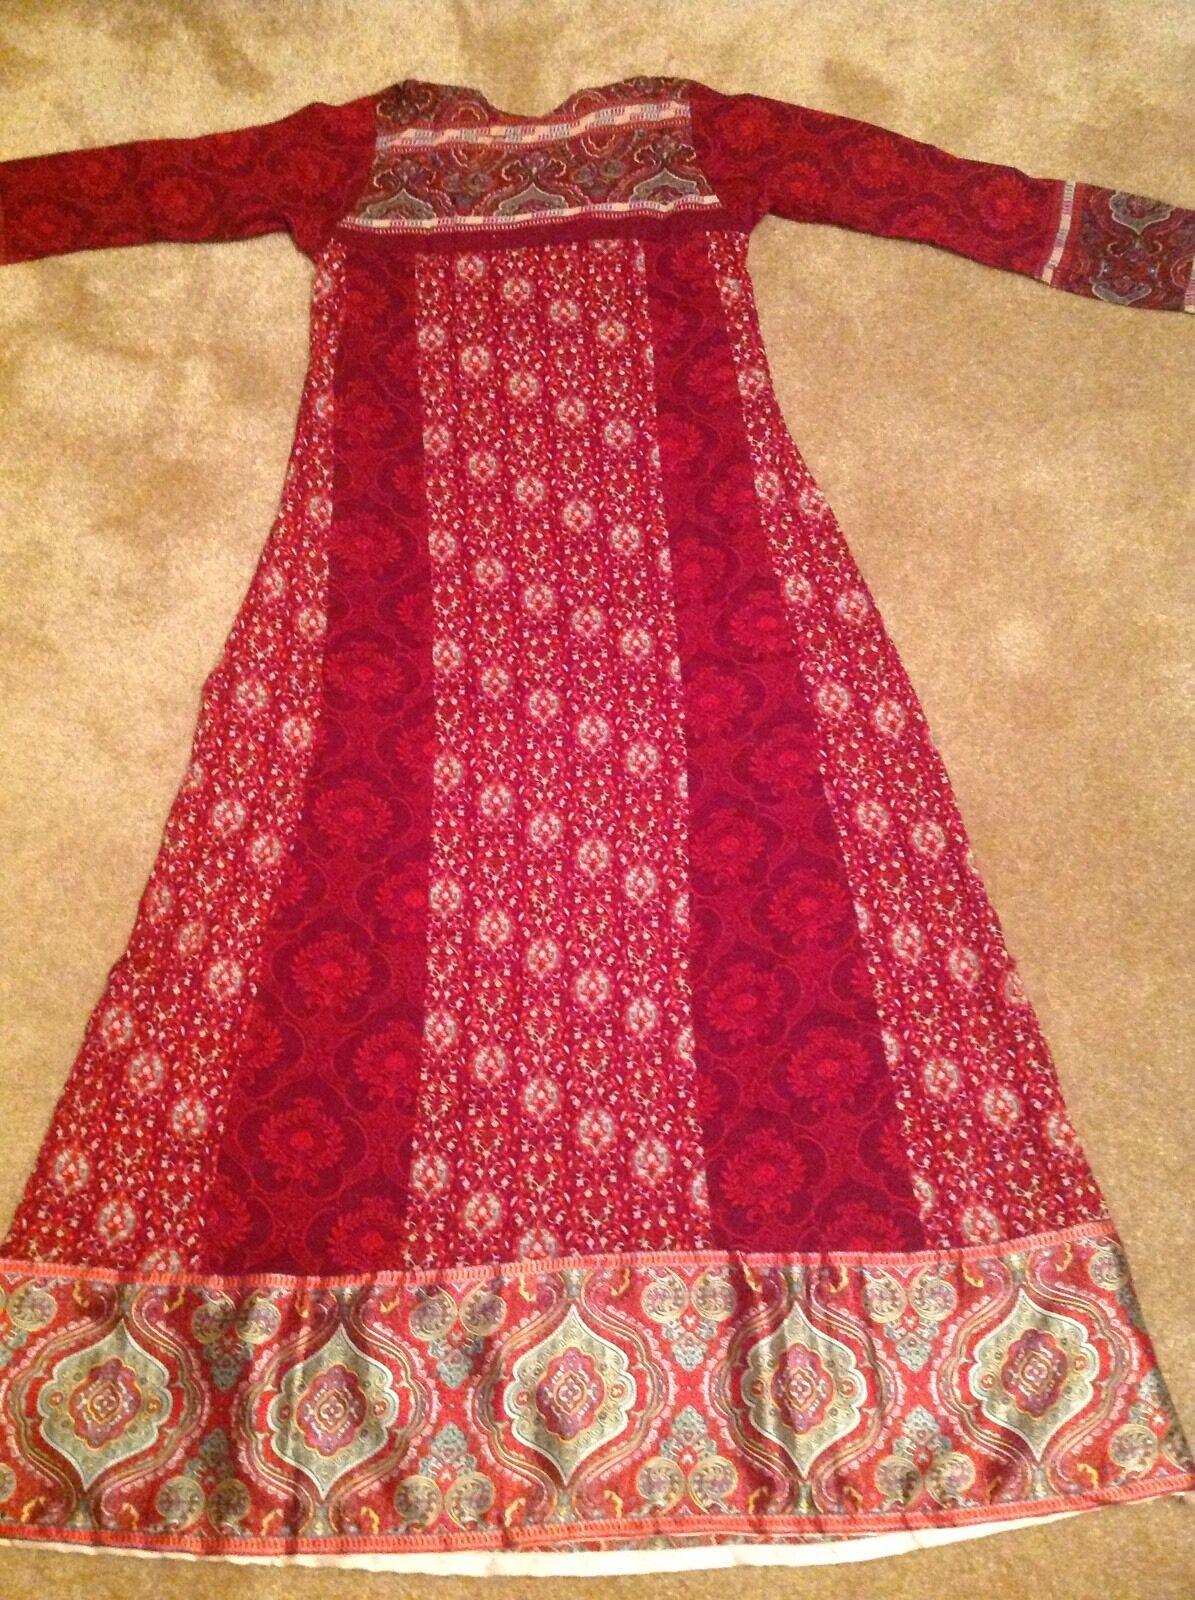 Designer sana SAFINAZ lakhany da Shariq Vestito Salwar Kameez Taglia Taglia Taglia 8-10 1d1d70